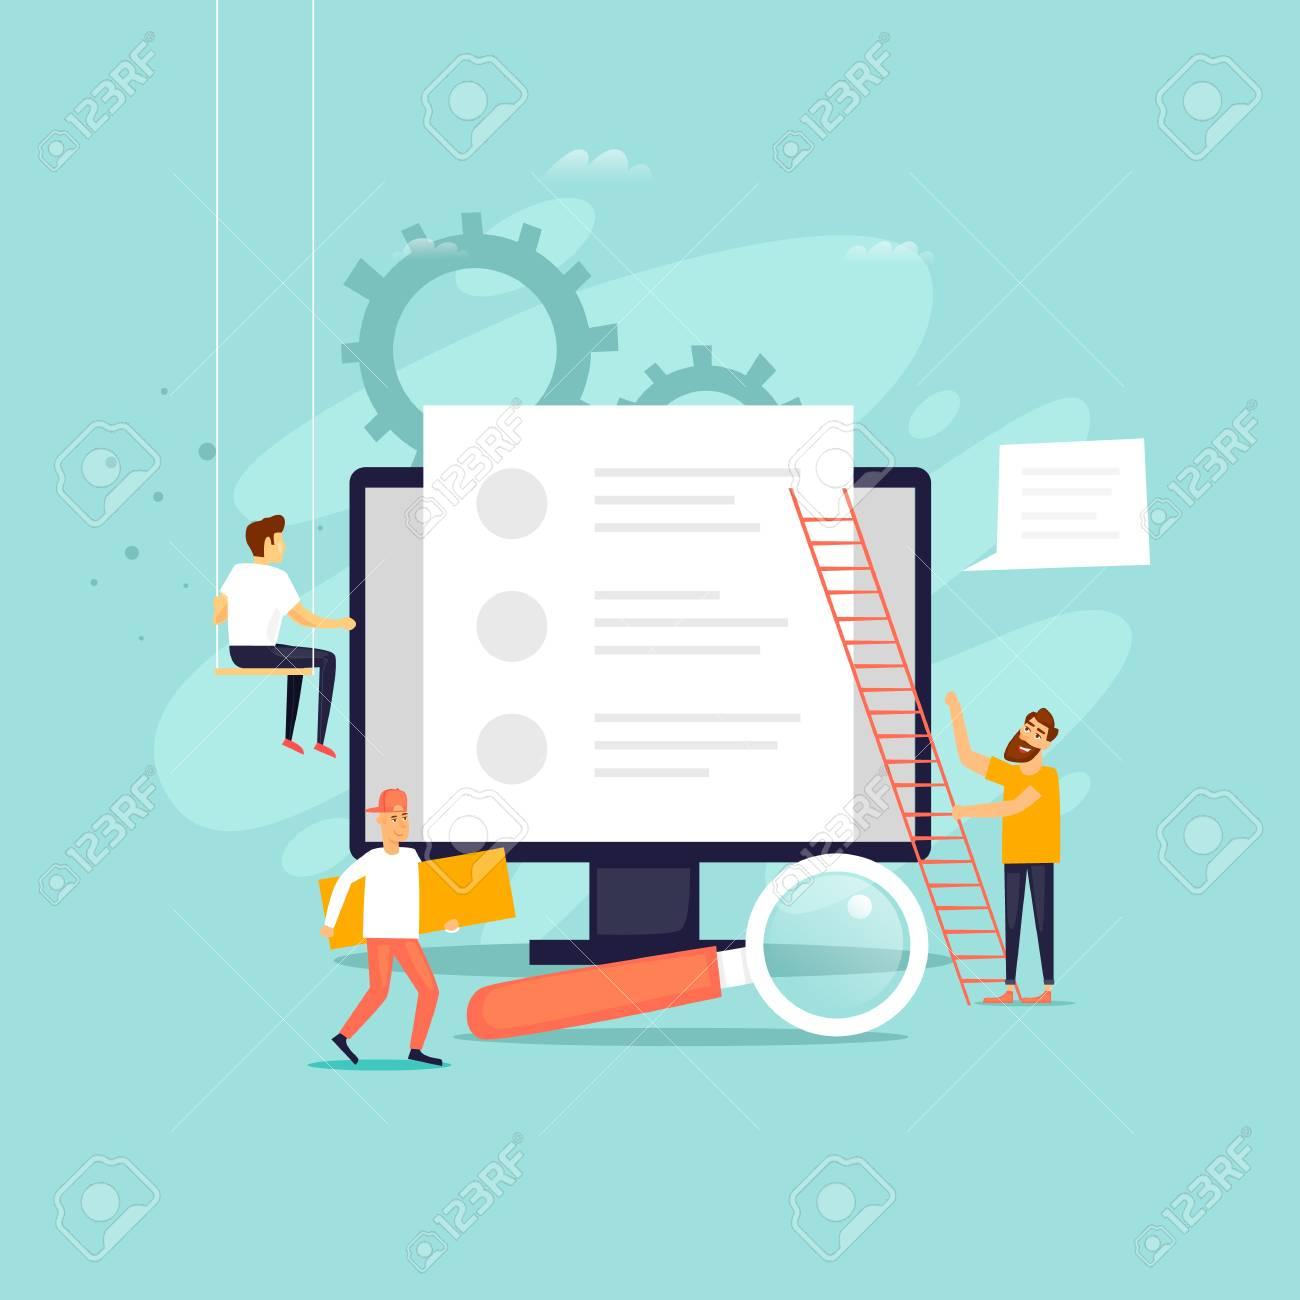 Copyright, blogging, people work near a computer, Internet. Flat design vector illustration. - 106684414